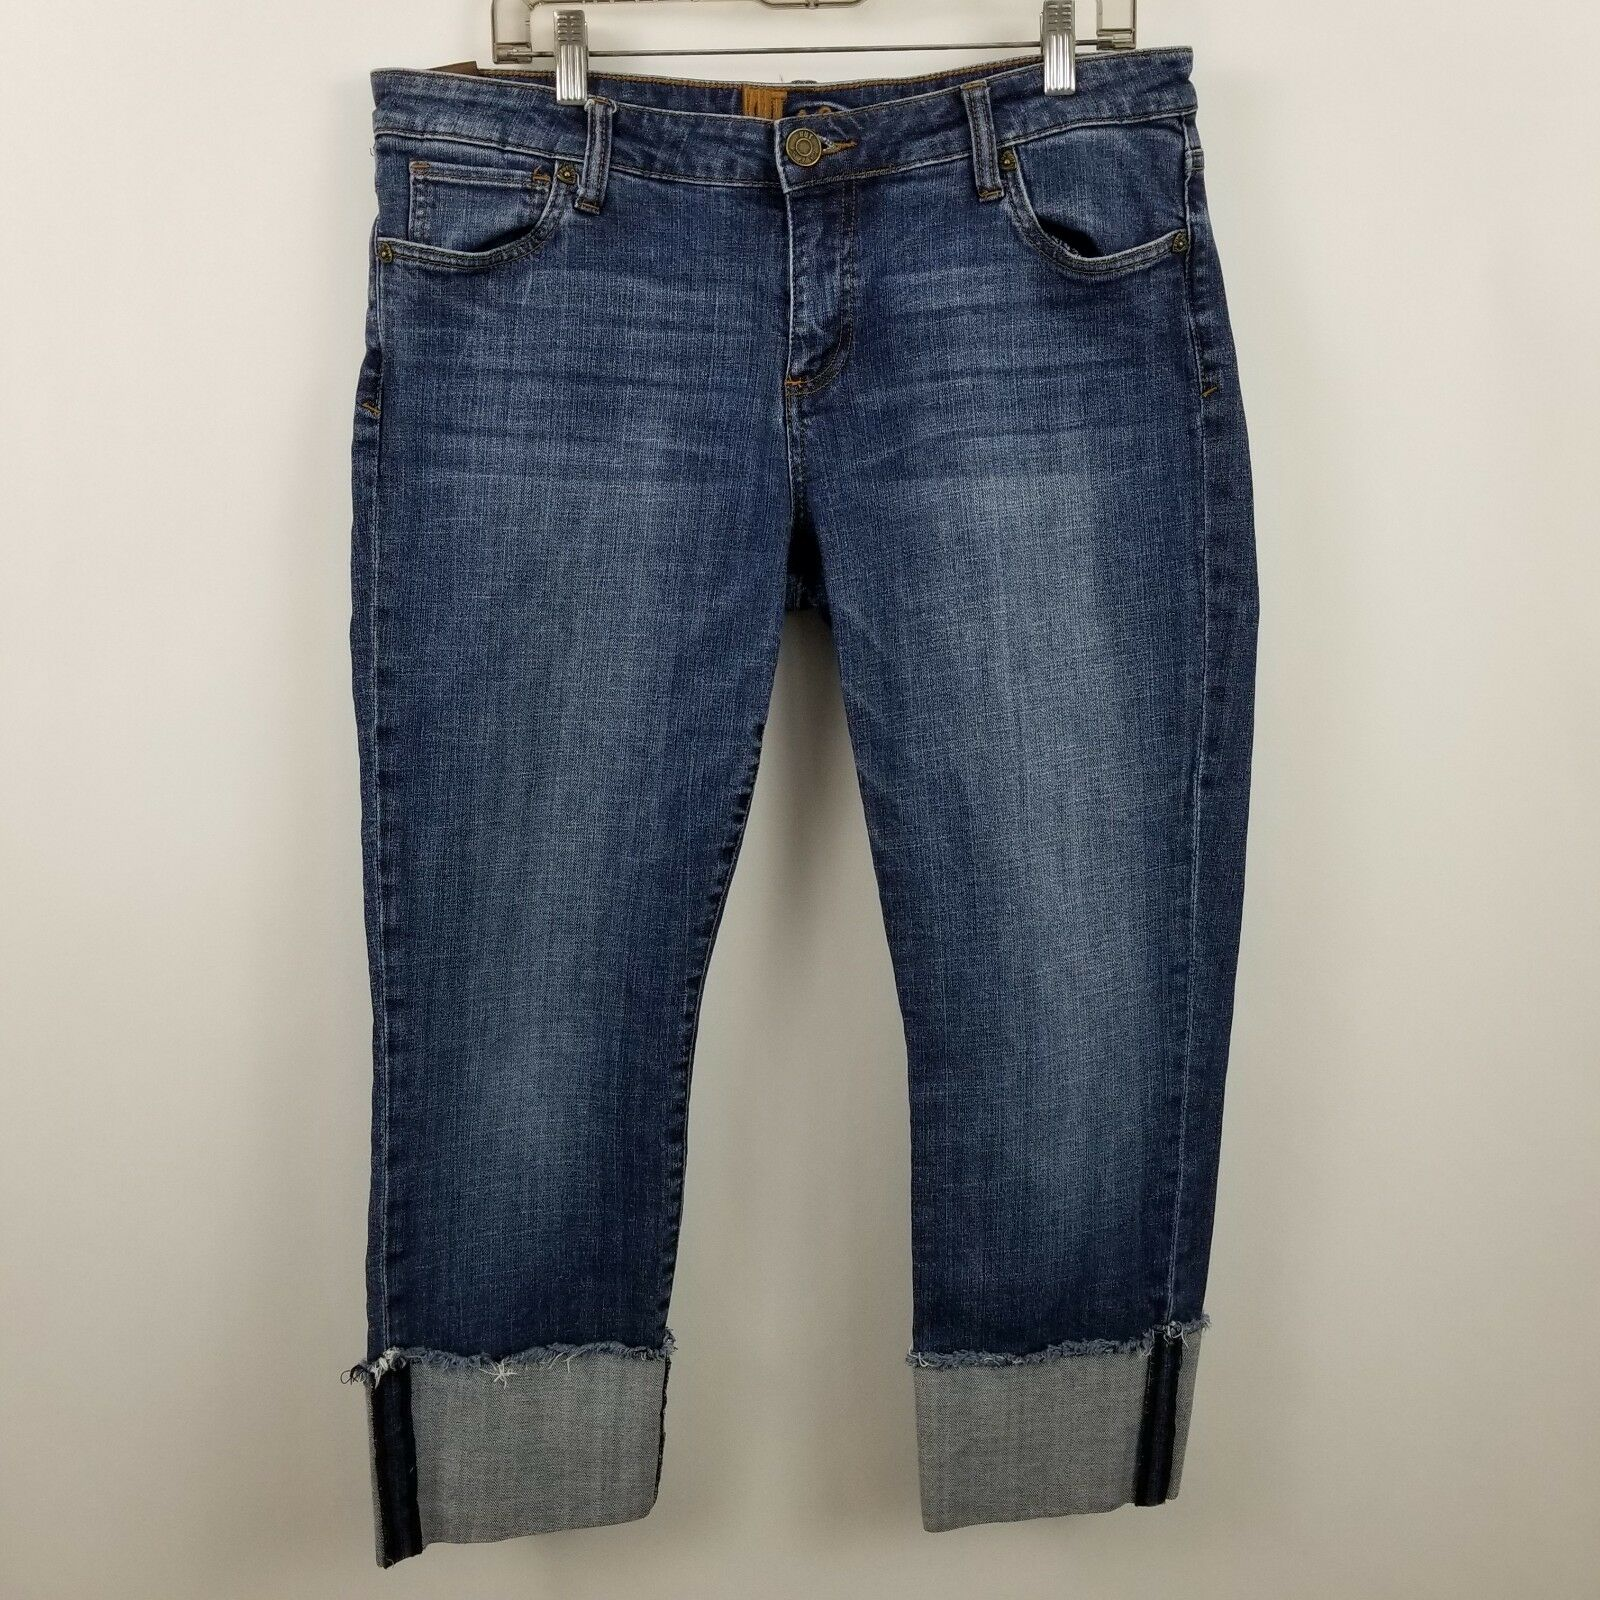 Kut From The Kloth Rolled Up Boyfriend Womens Dark Wash bluee Jeans Size 12